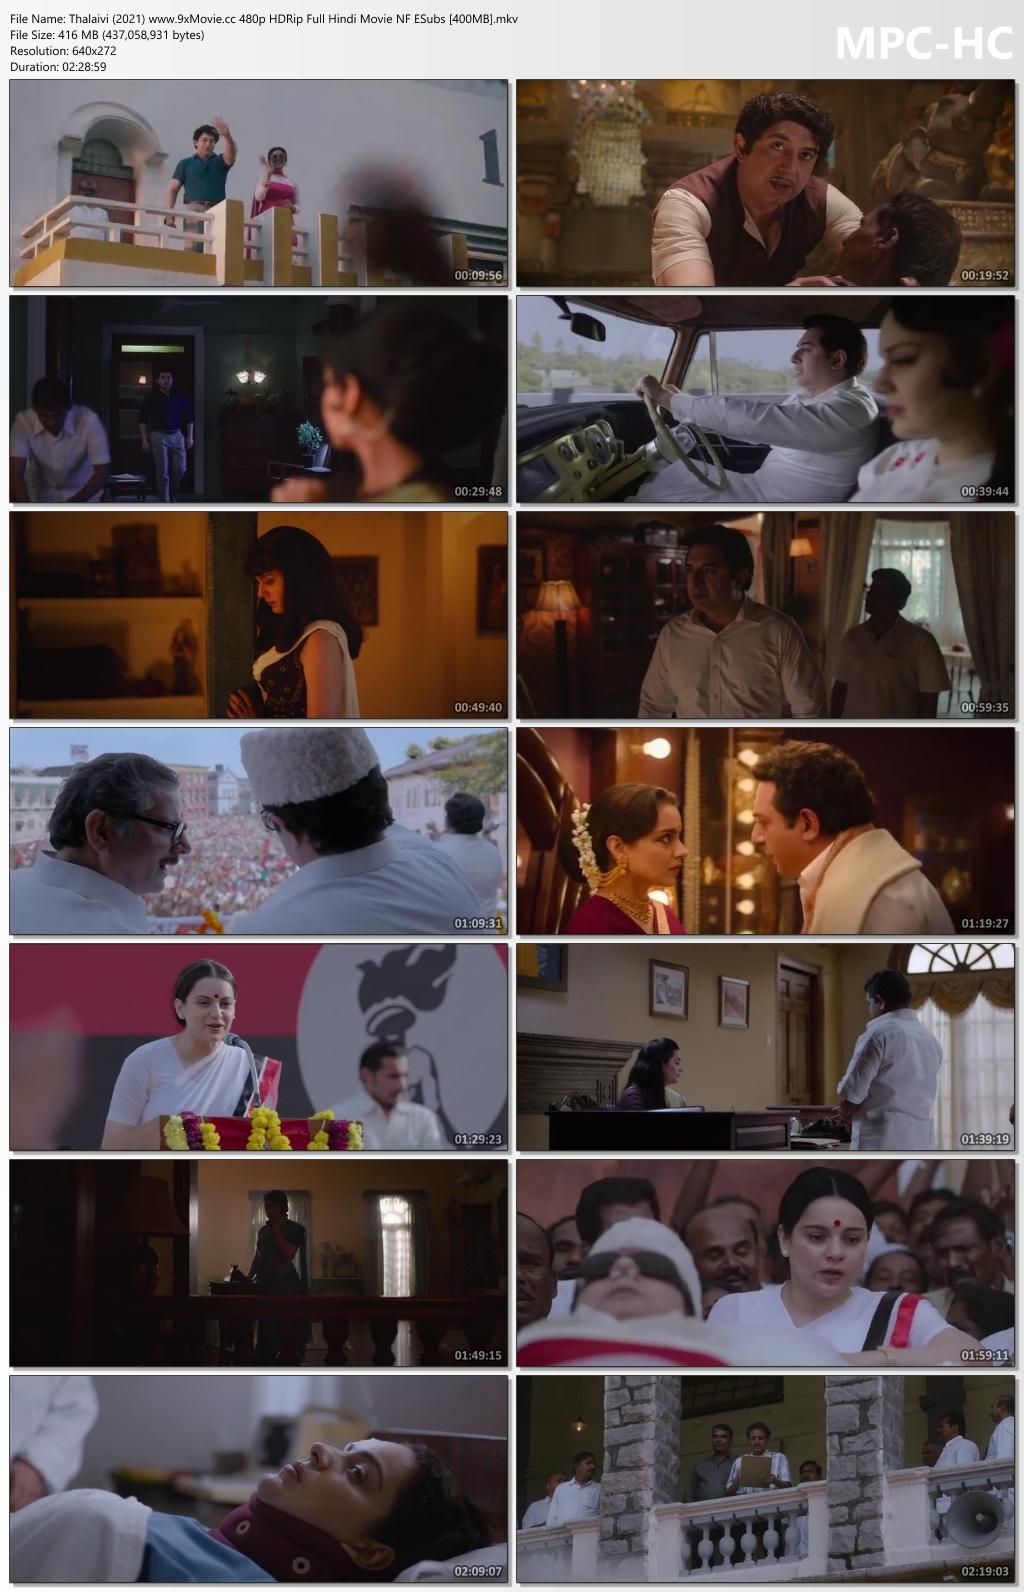 Thalaivi-2021-www-9x-Movie-cc-480p-HDRip-Full-Hindi-Movie-NF-ESubs-400-MB-mkv